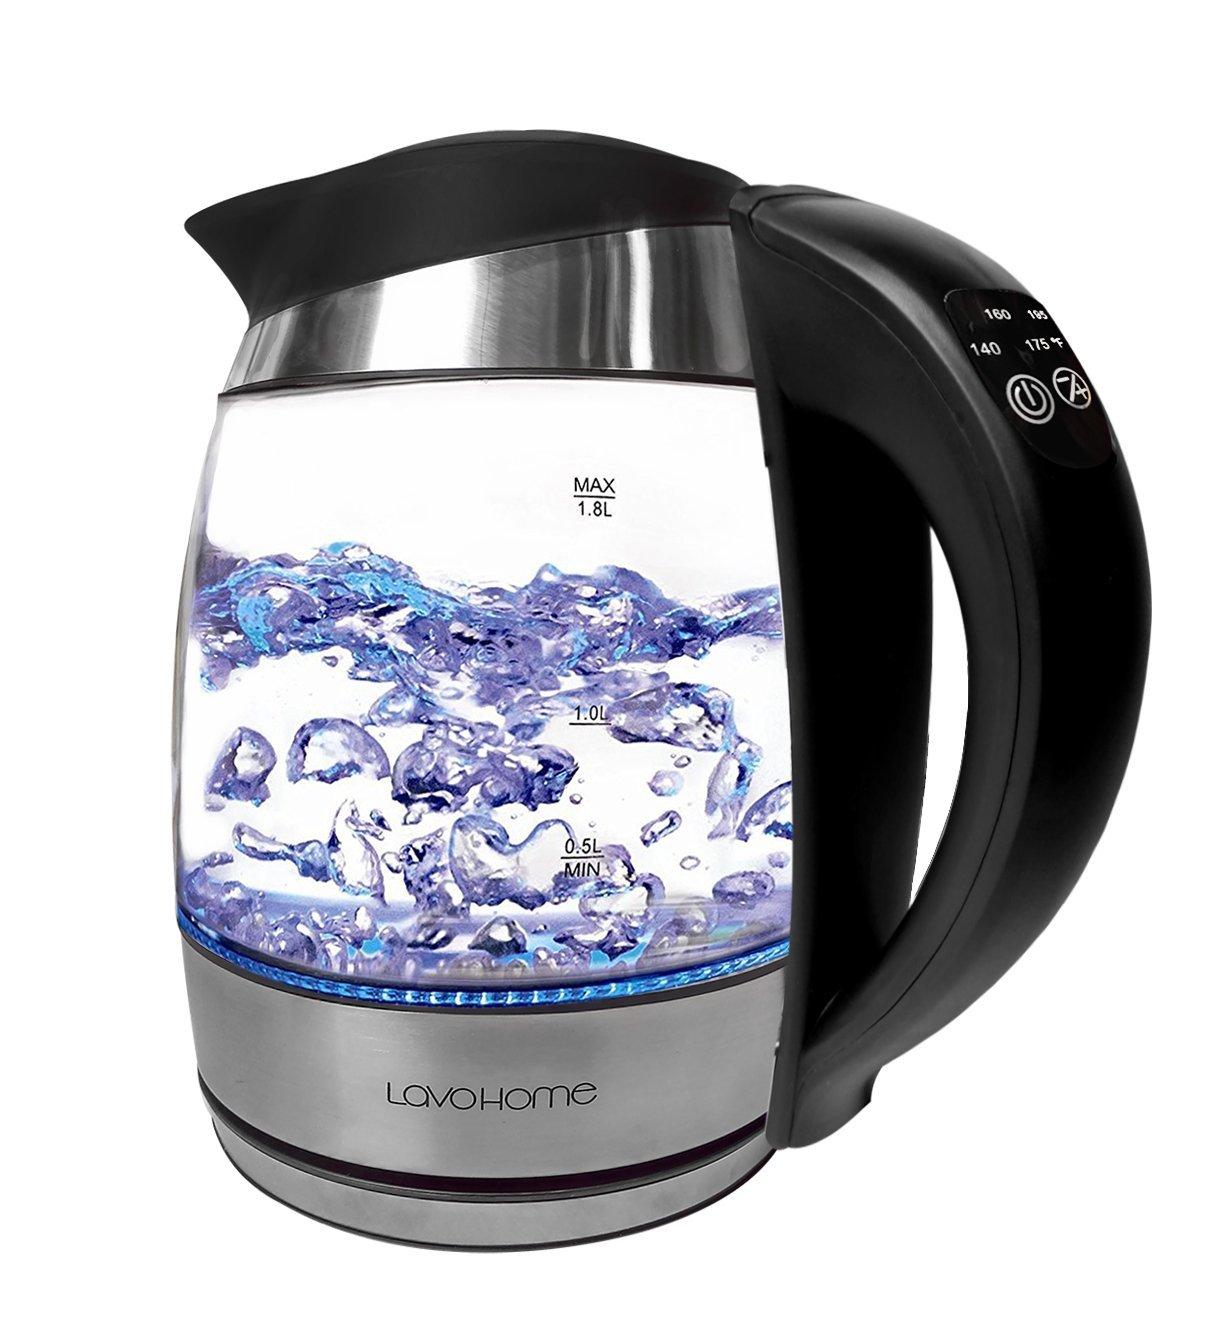 Precision 1.8-liter Electric Tea Kettle Rapid Boil, 5 Pre...